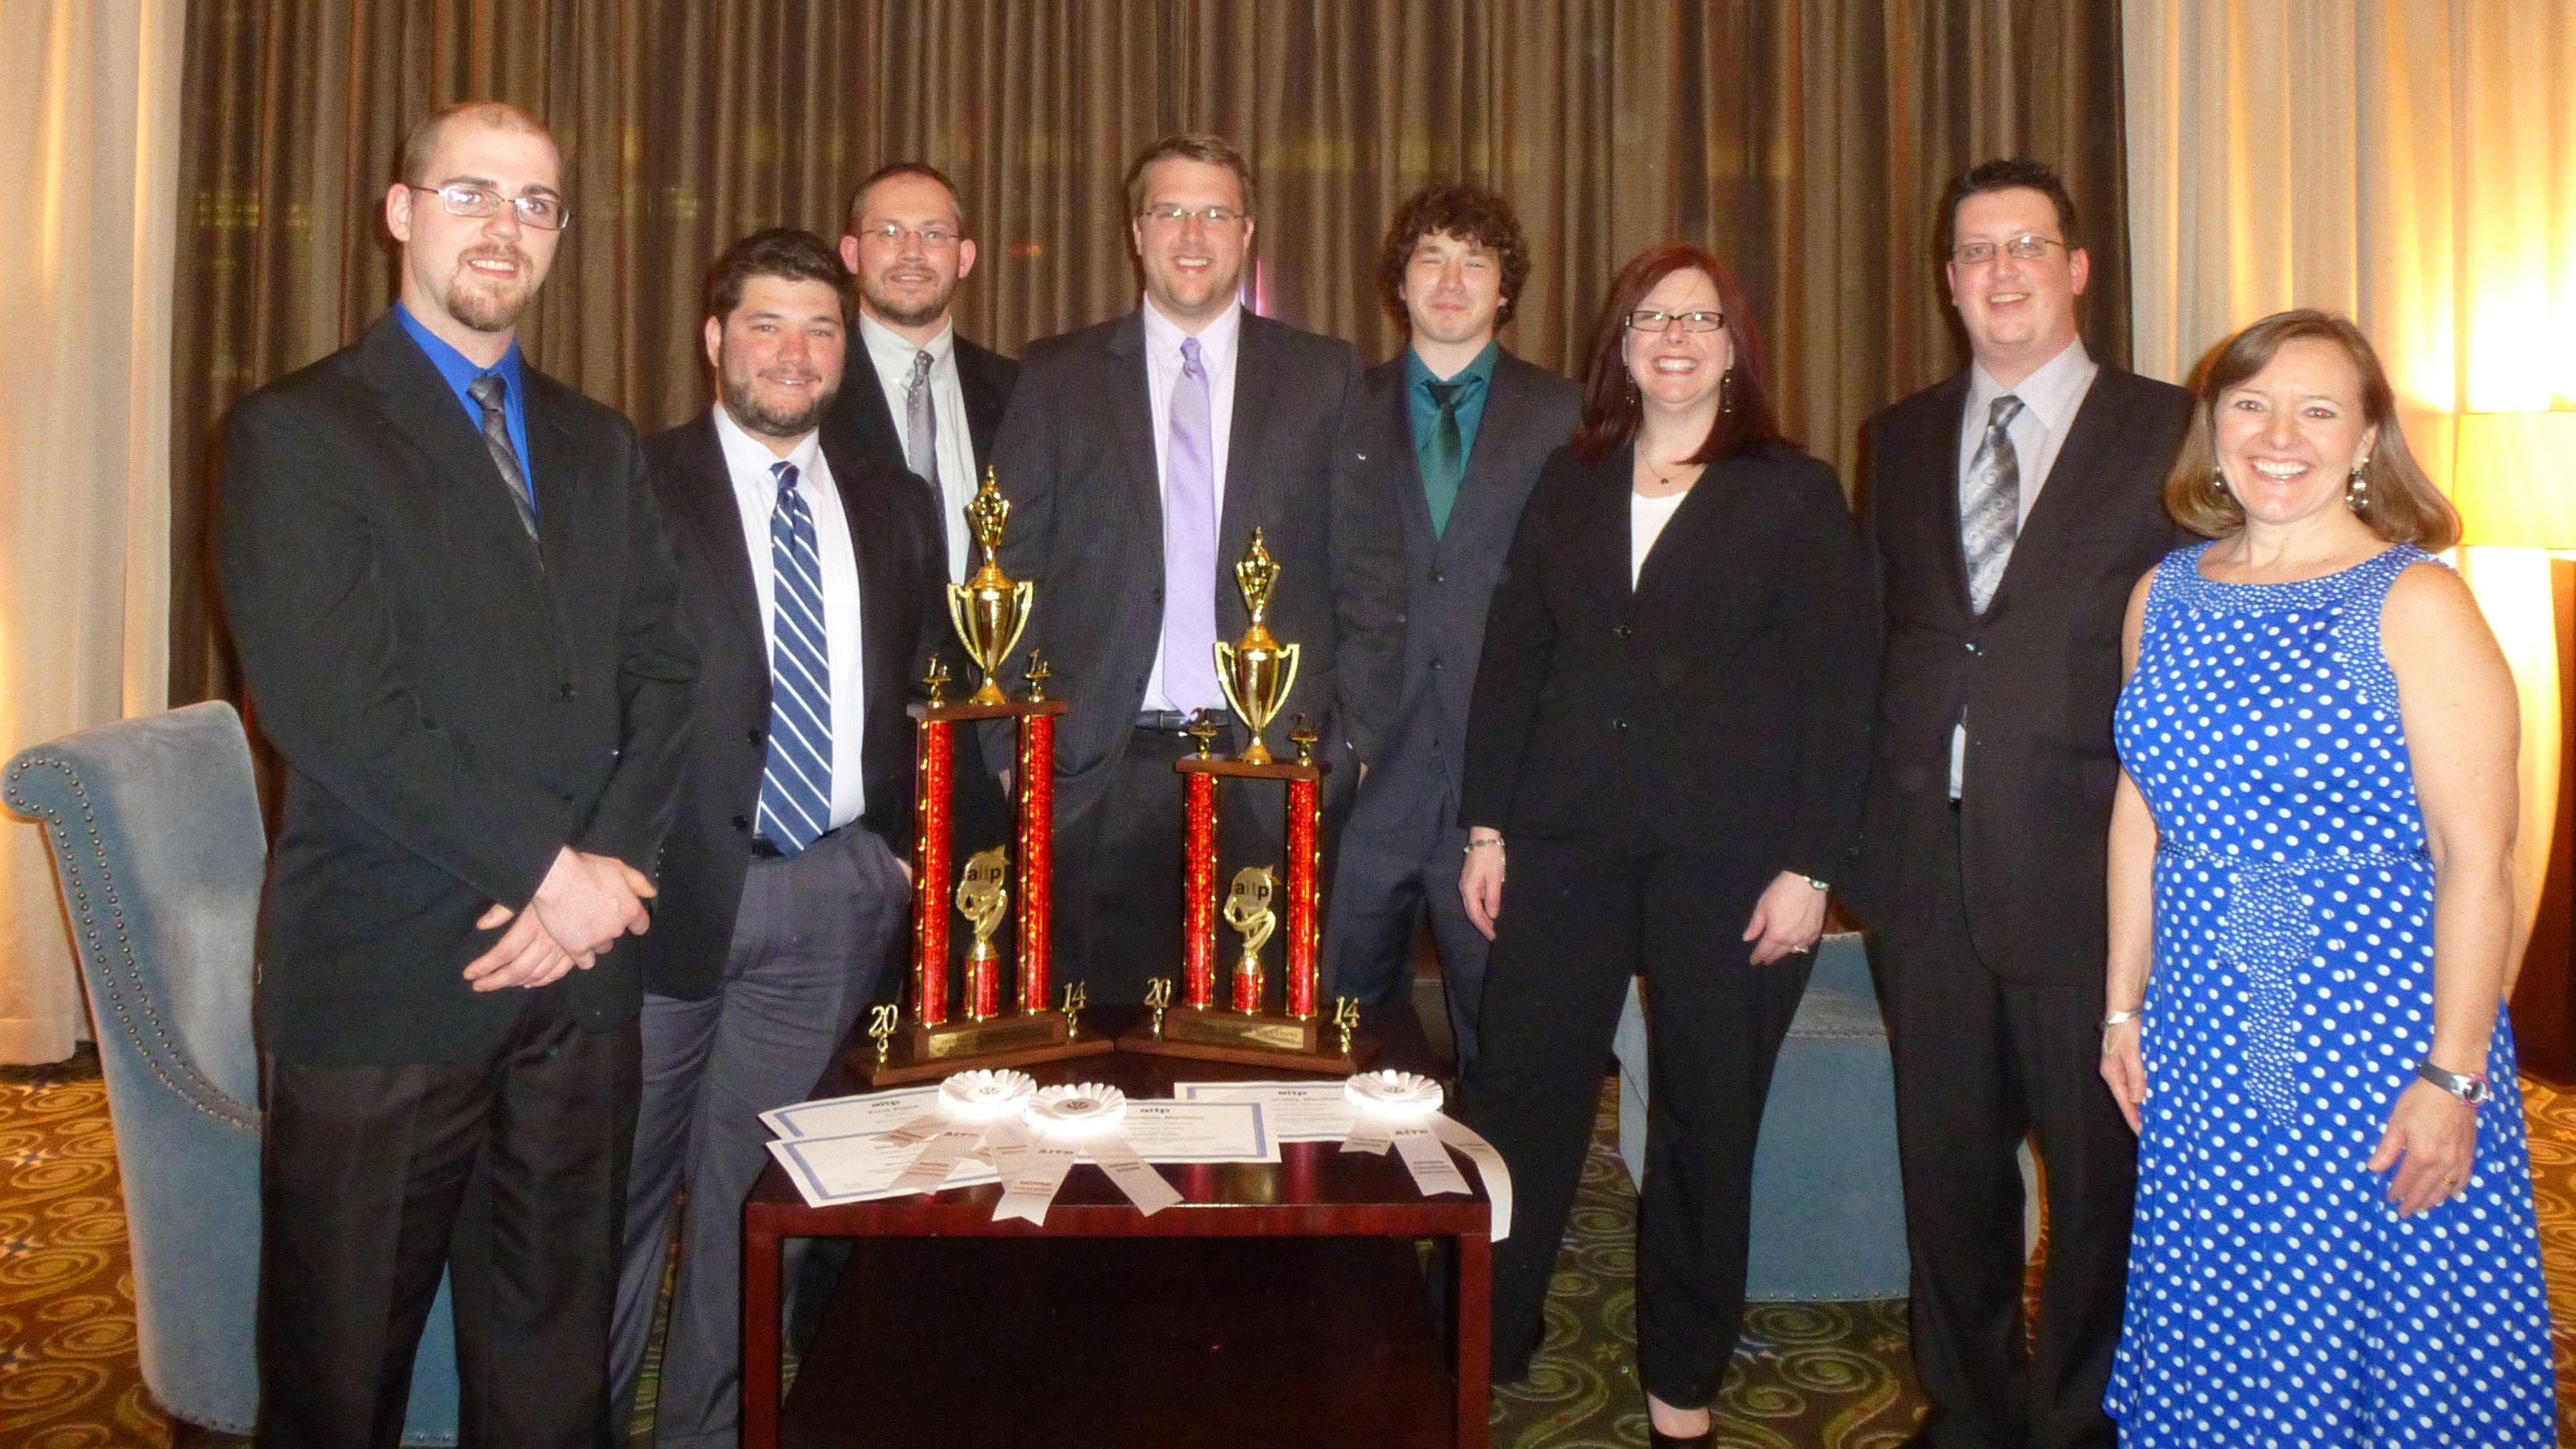 AITP Wins Big at National Conference